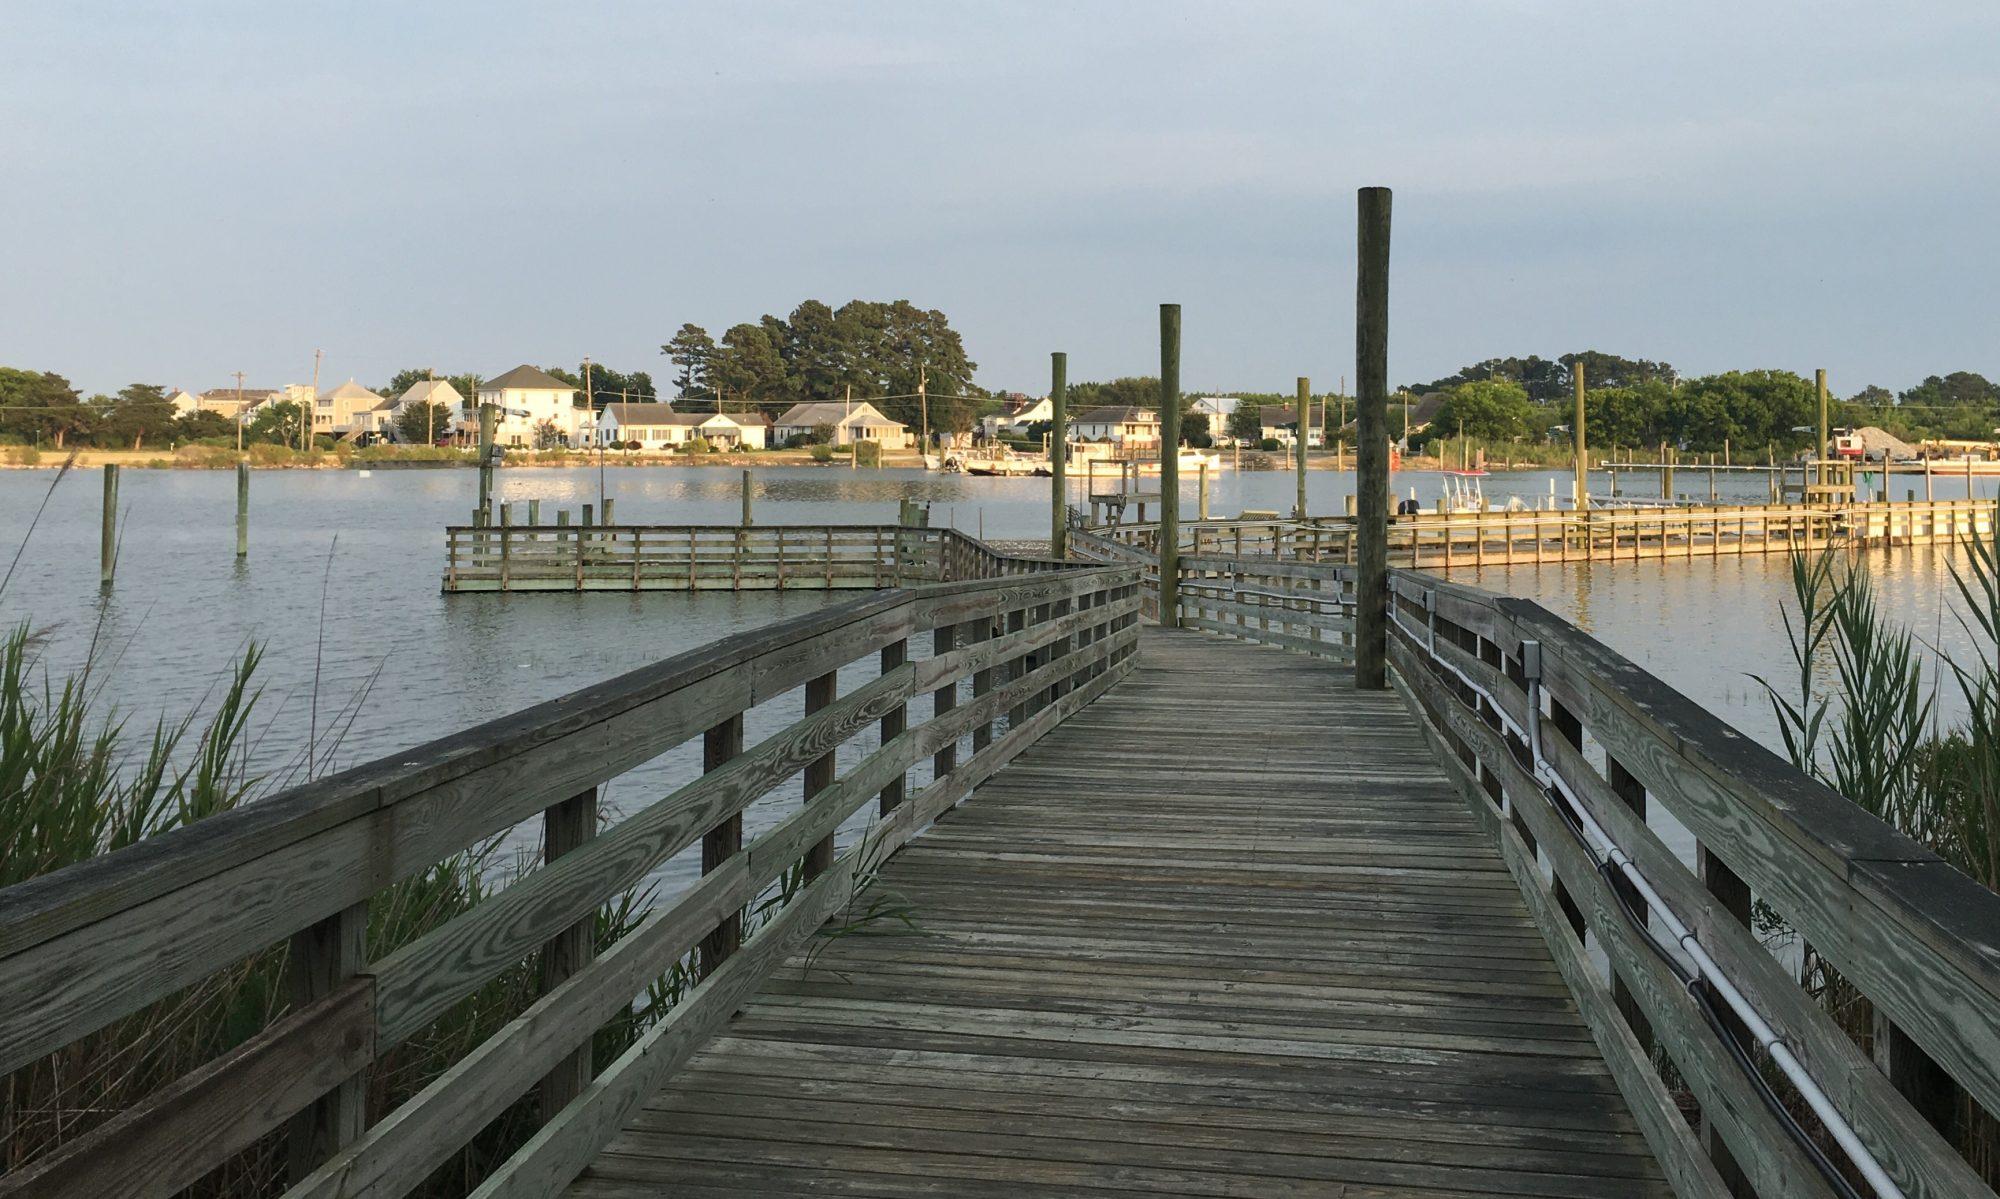 University of Virginia's Coastal Research Center